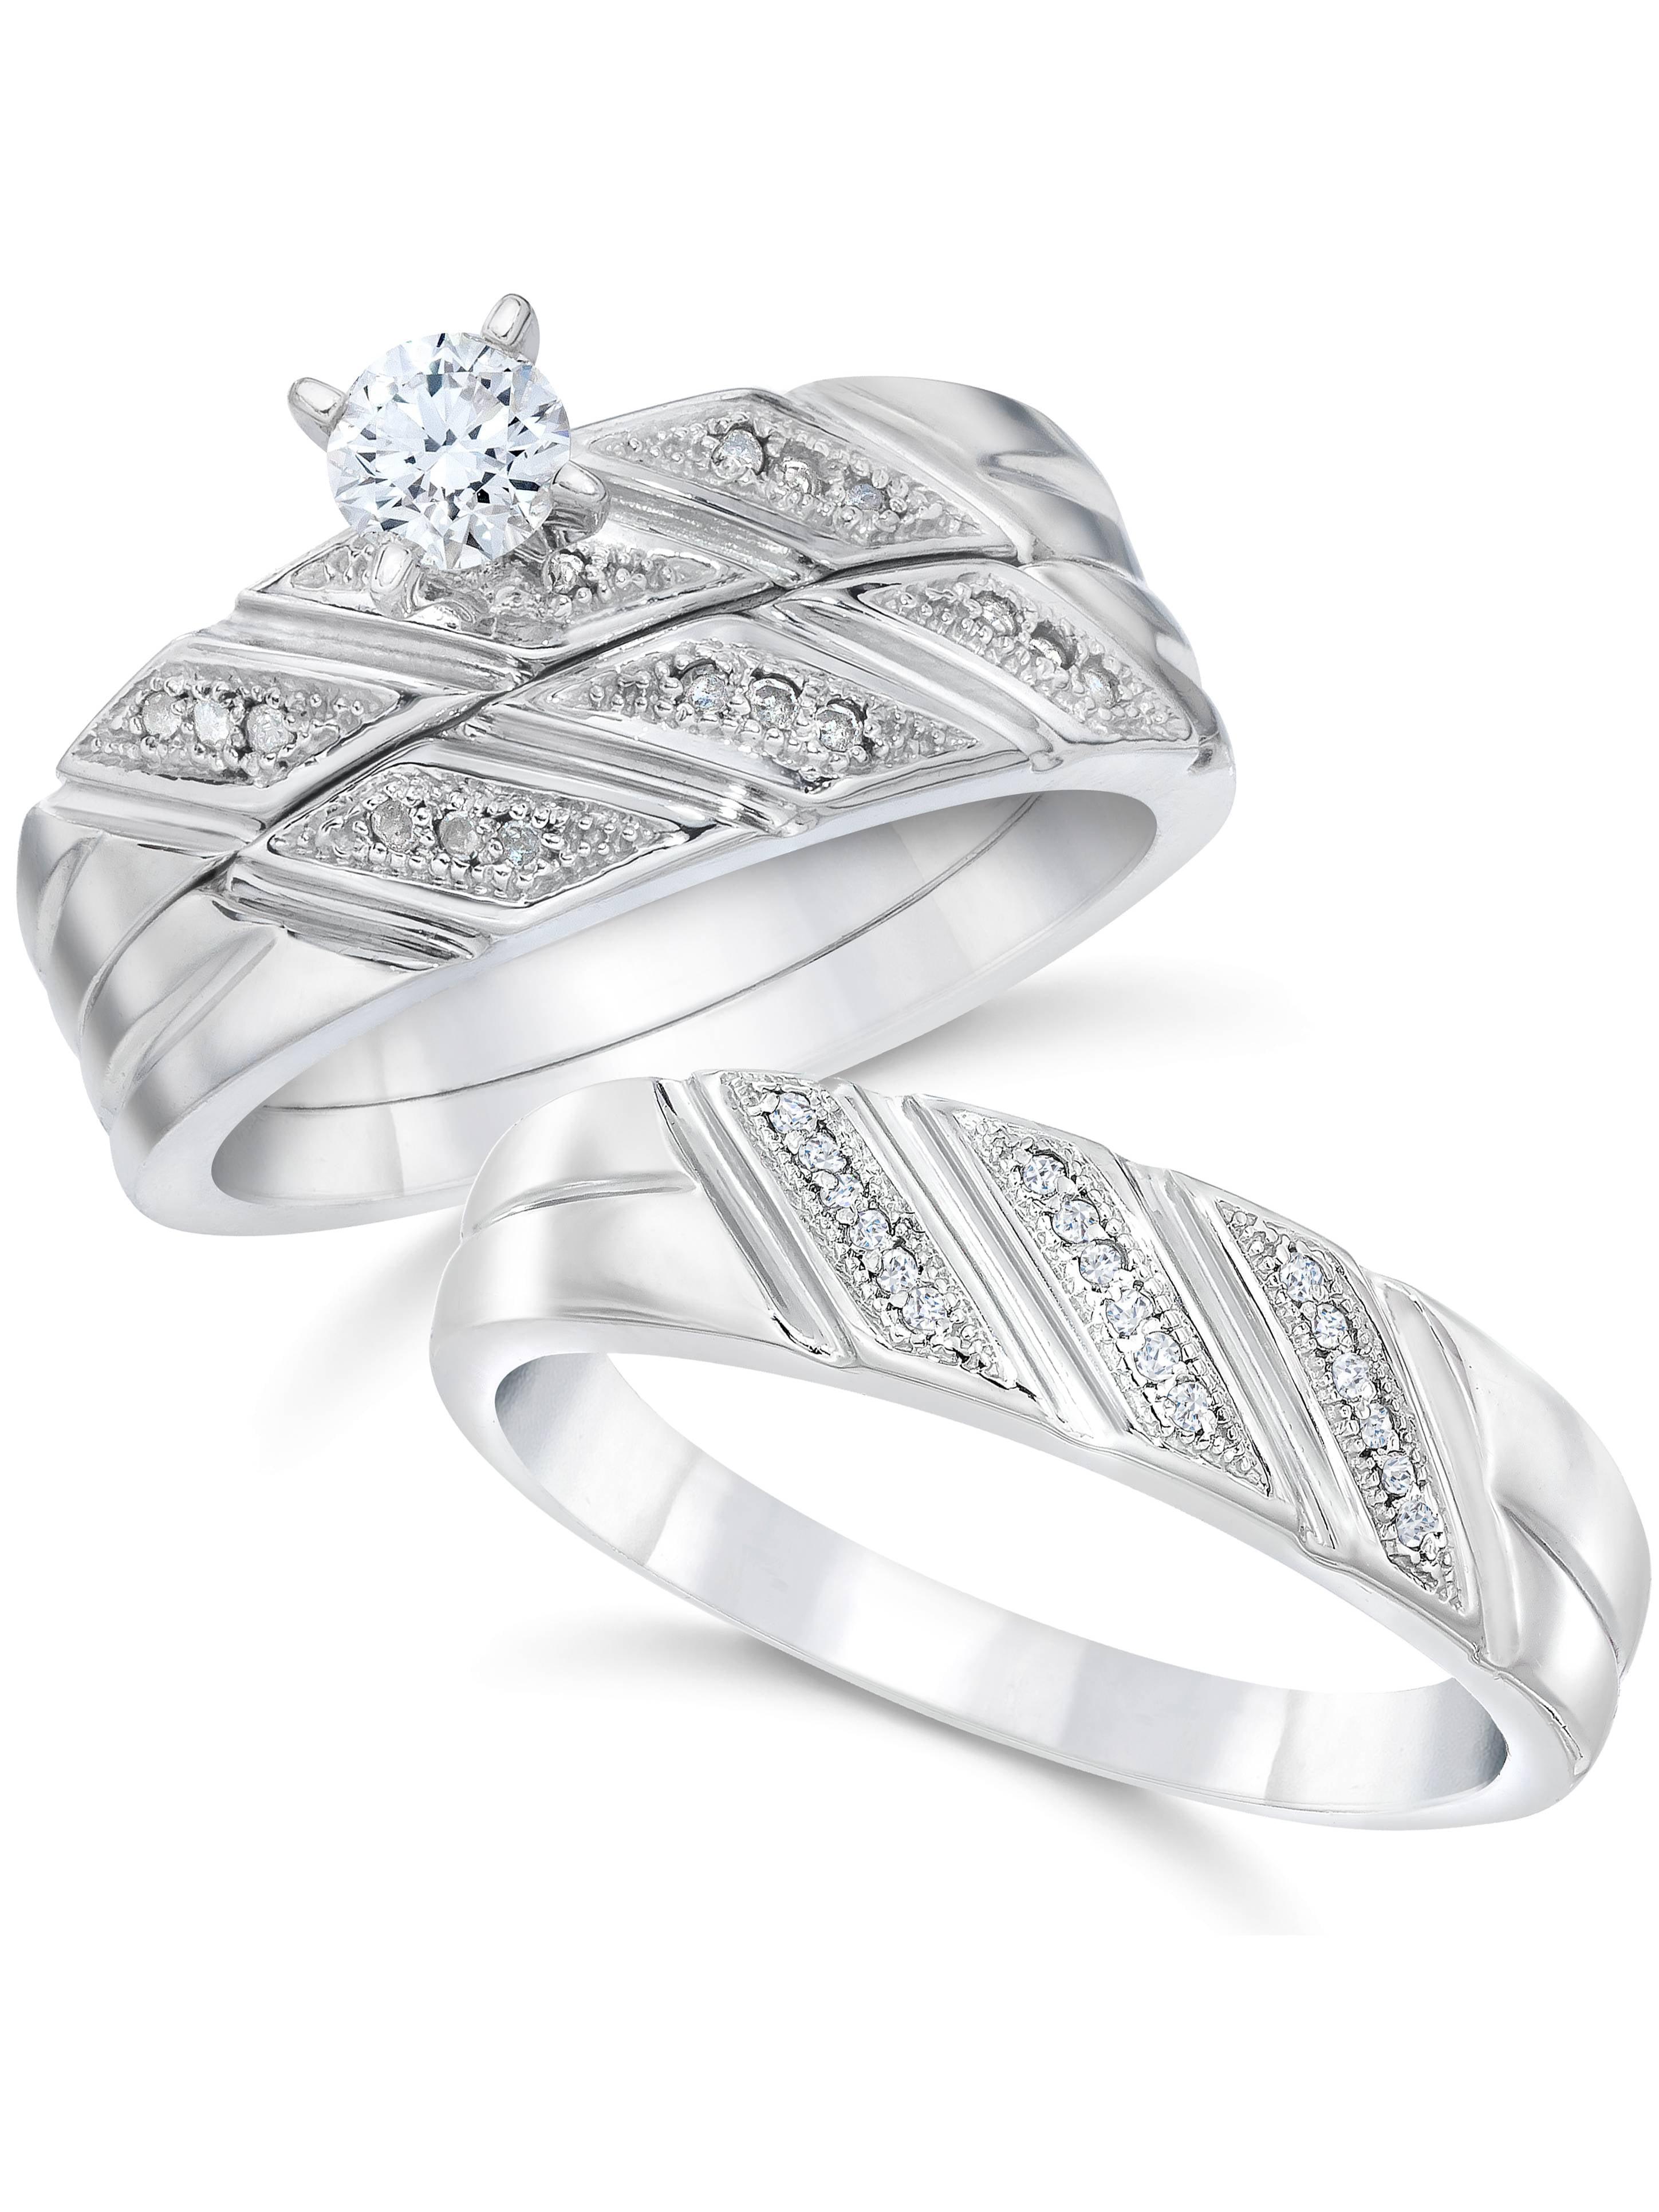 Pompeii3 1 3ct His Hers Diamond Trio Engagement Matching Mens